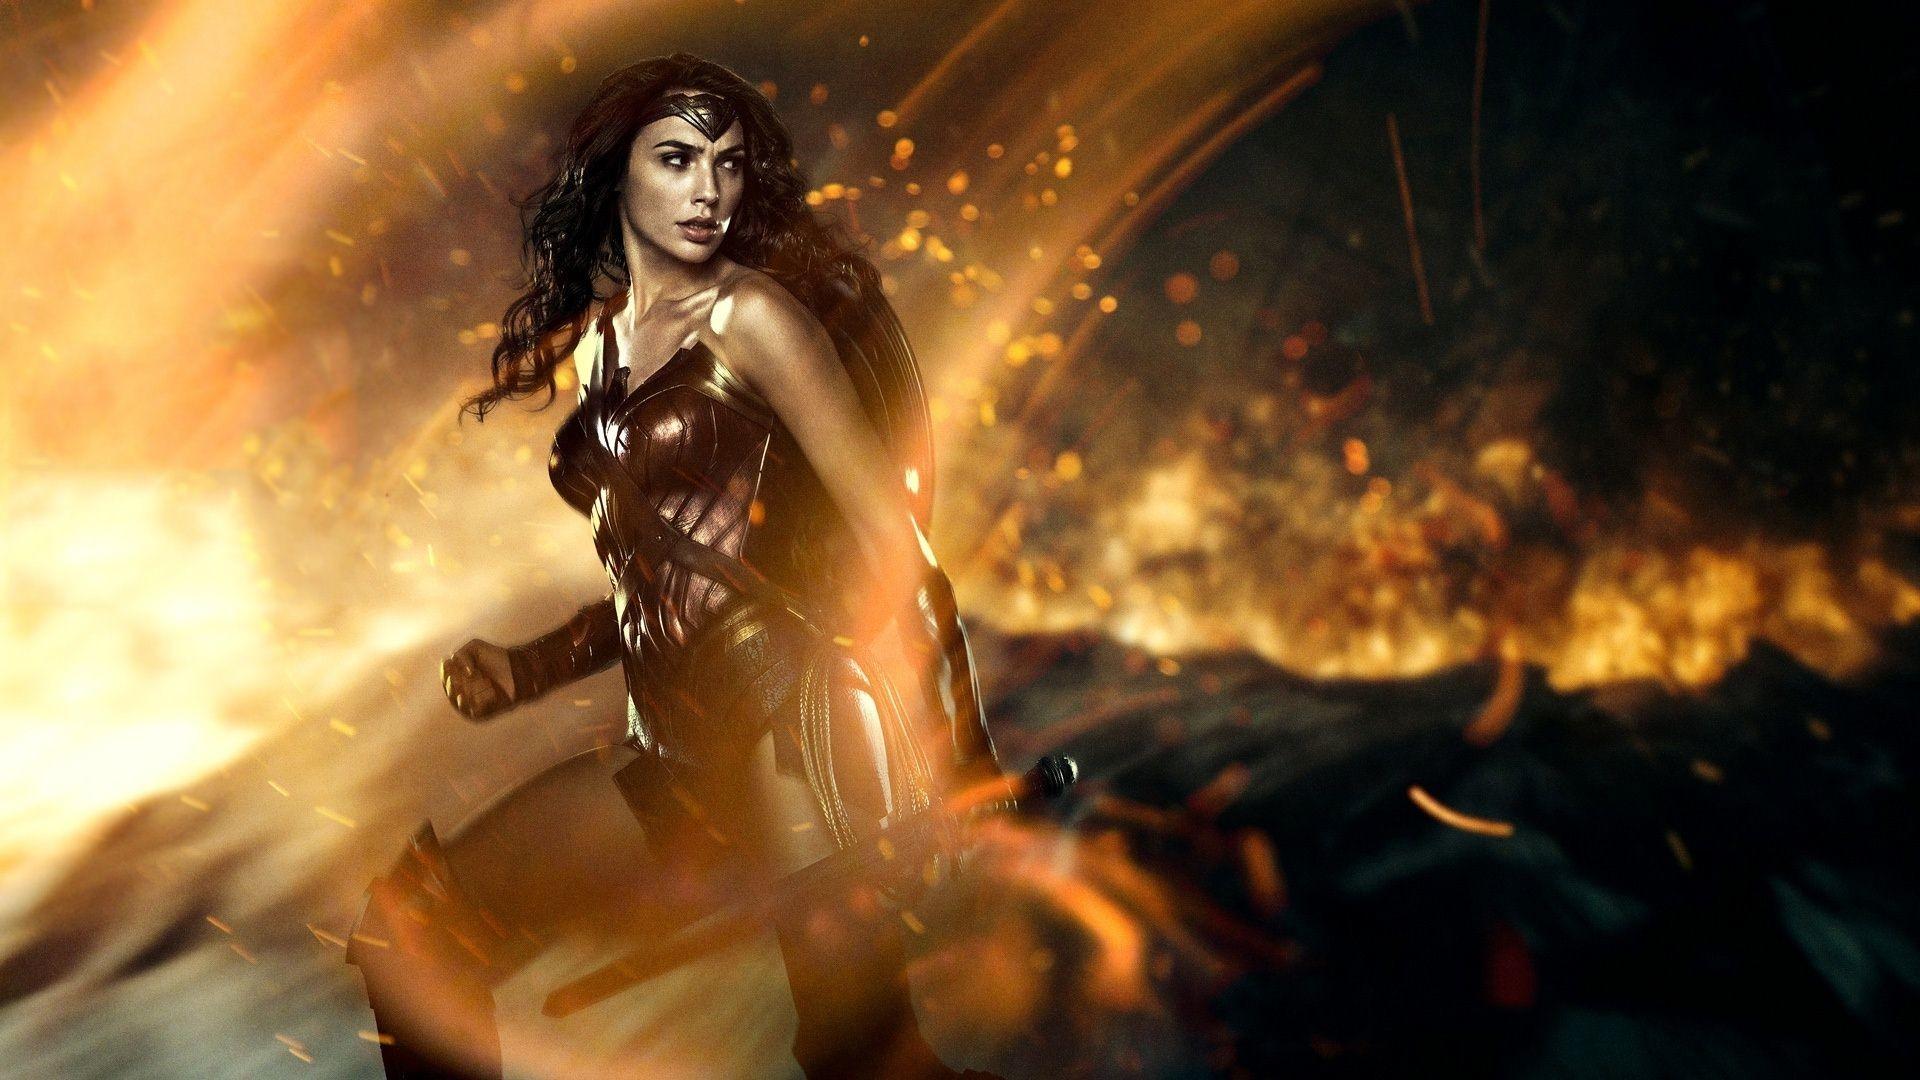 Wonder Woman Gal Gadot Wallpapers: Wonder Woman Wallpaper (71+ Images